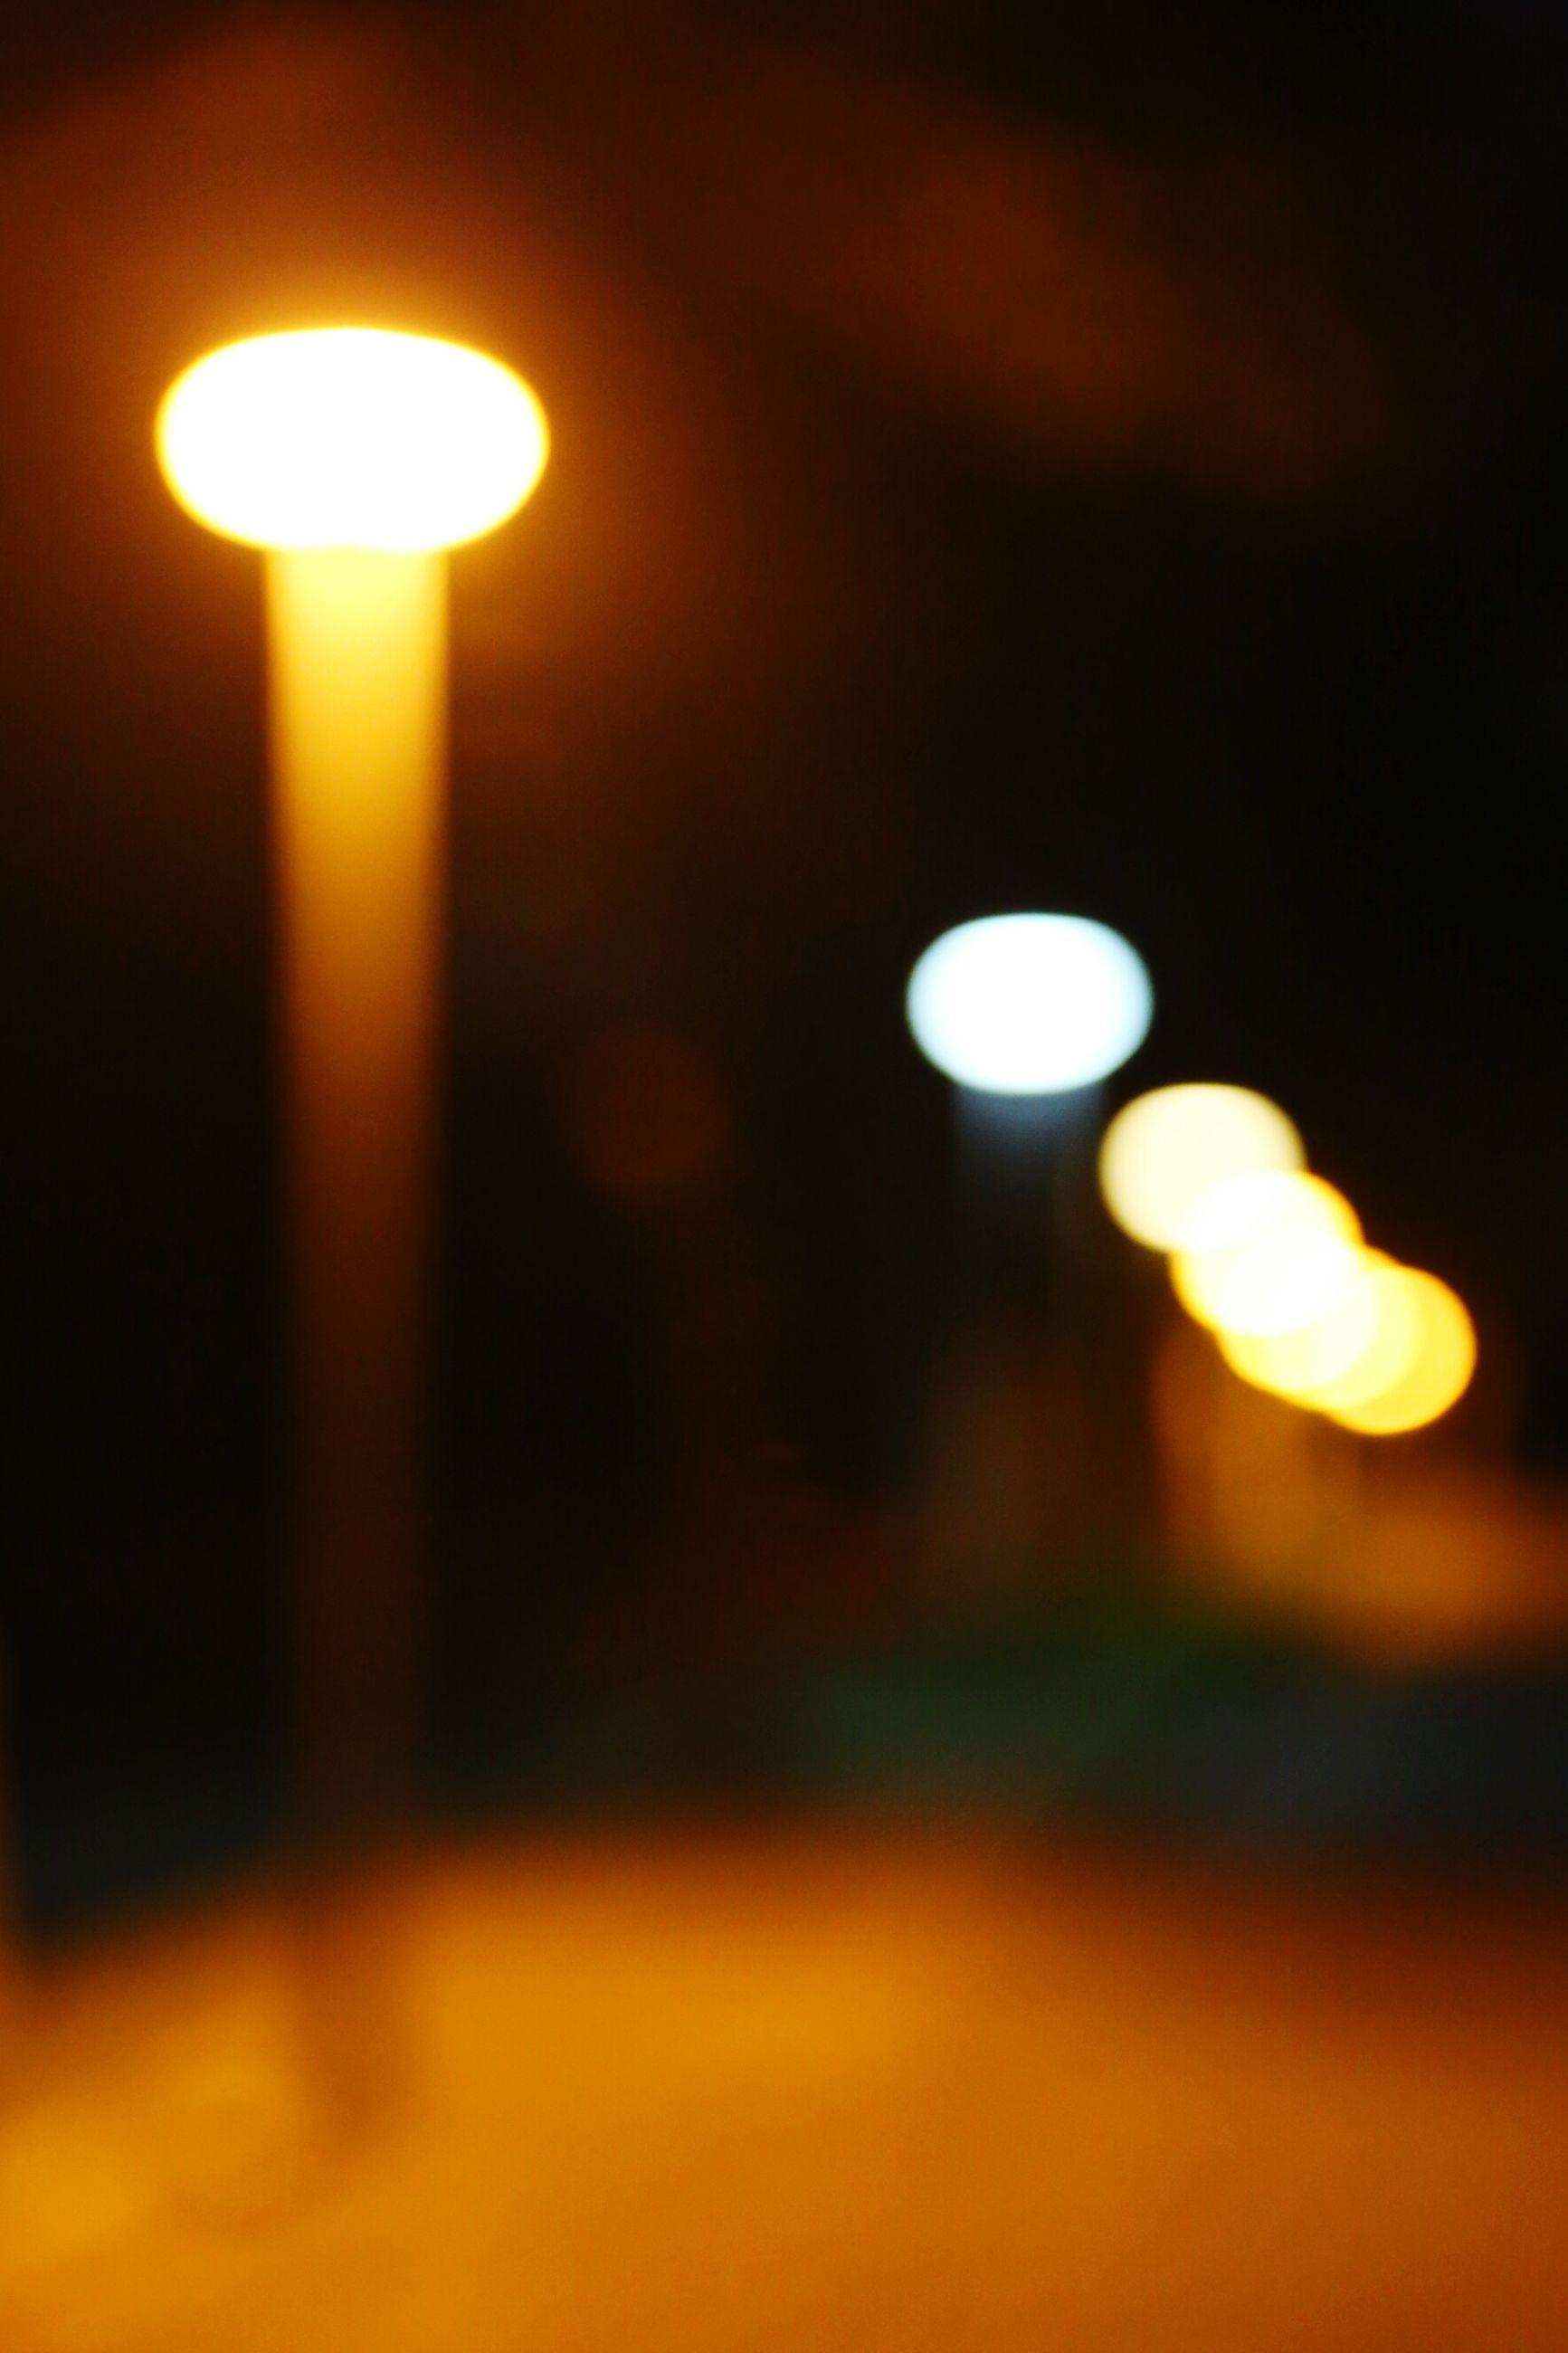 illuminated, night, lighting equipment, glowing, defocused, light - natural phenomenon, electricity, electric light, lens flare, street light, light, circle, dark, lit, moon, no people, orange color, close-up, focus on foreground, electric lamp